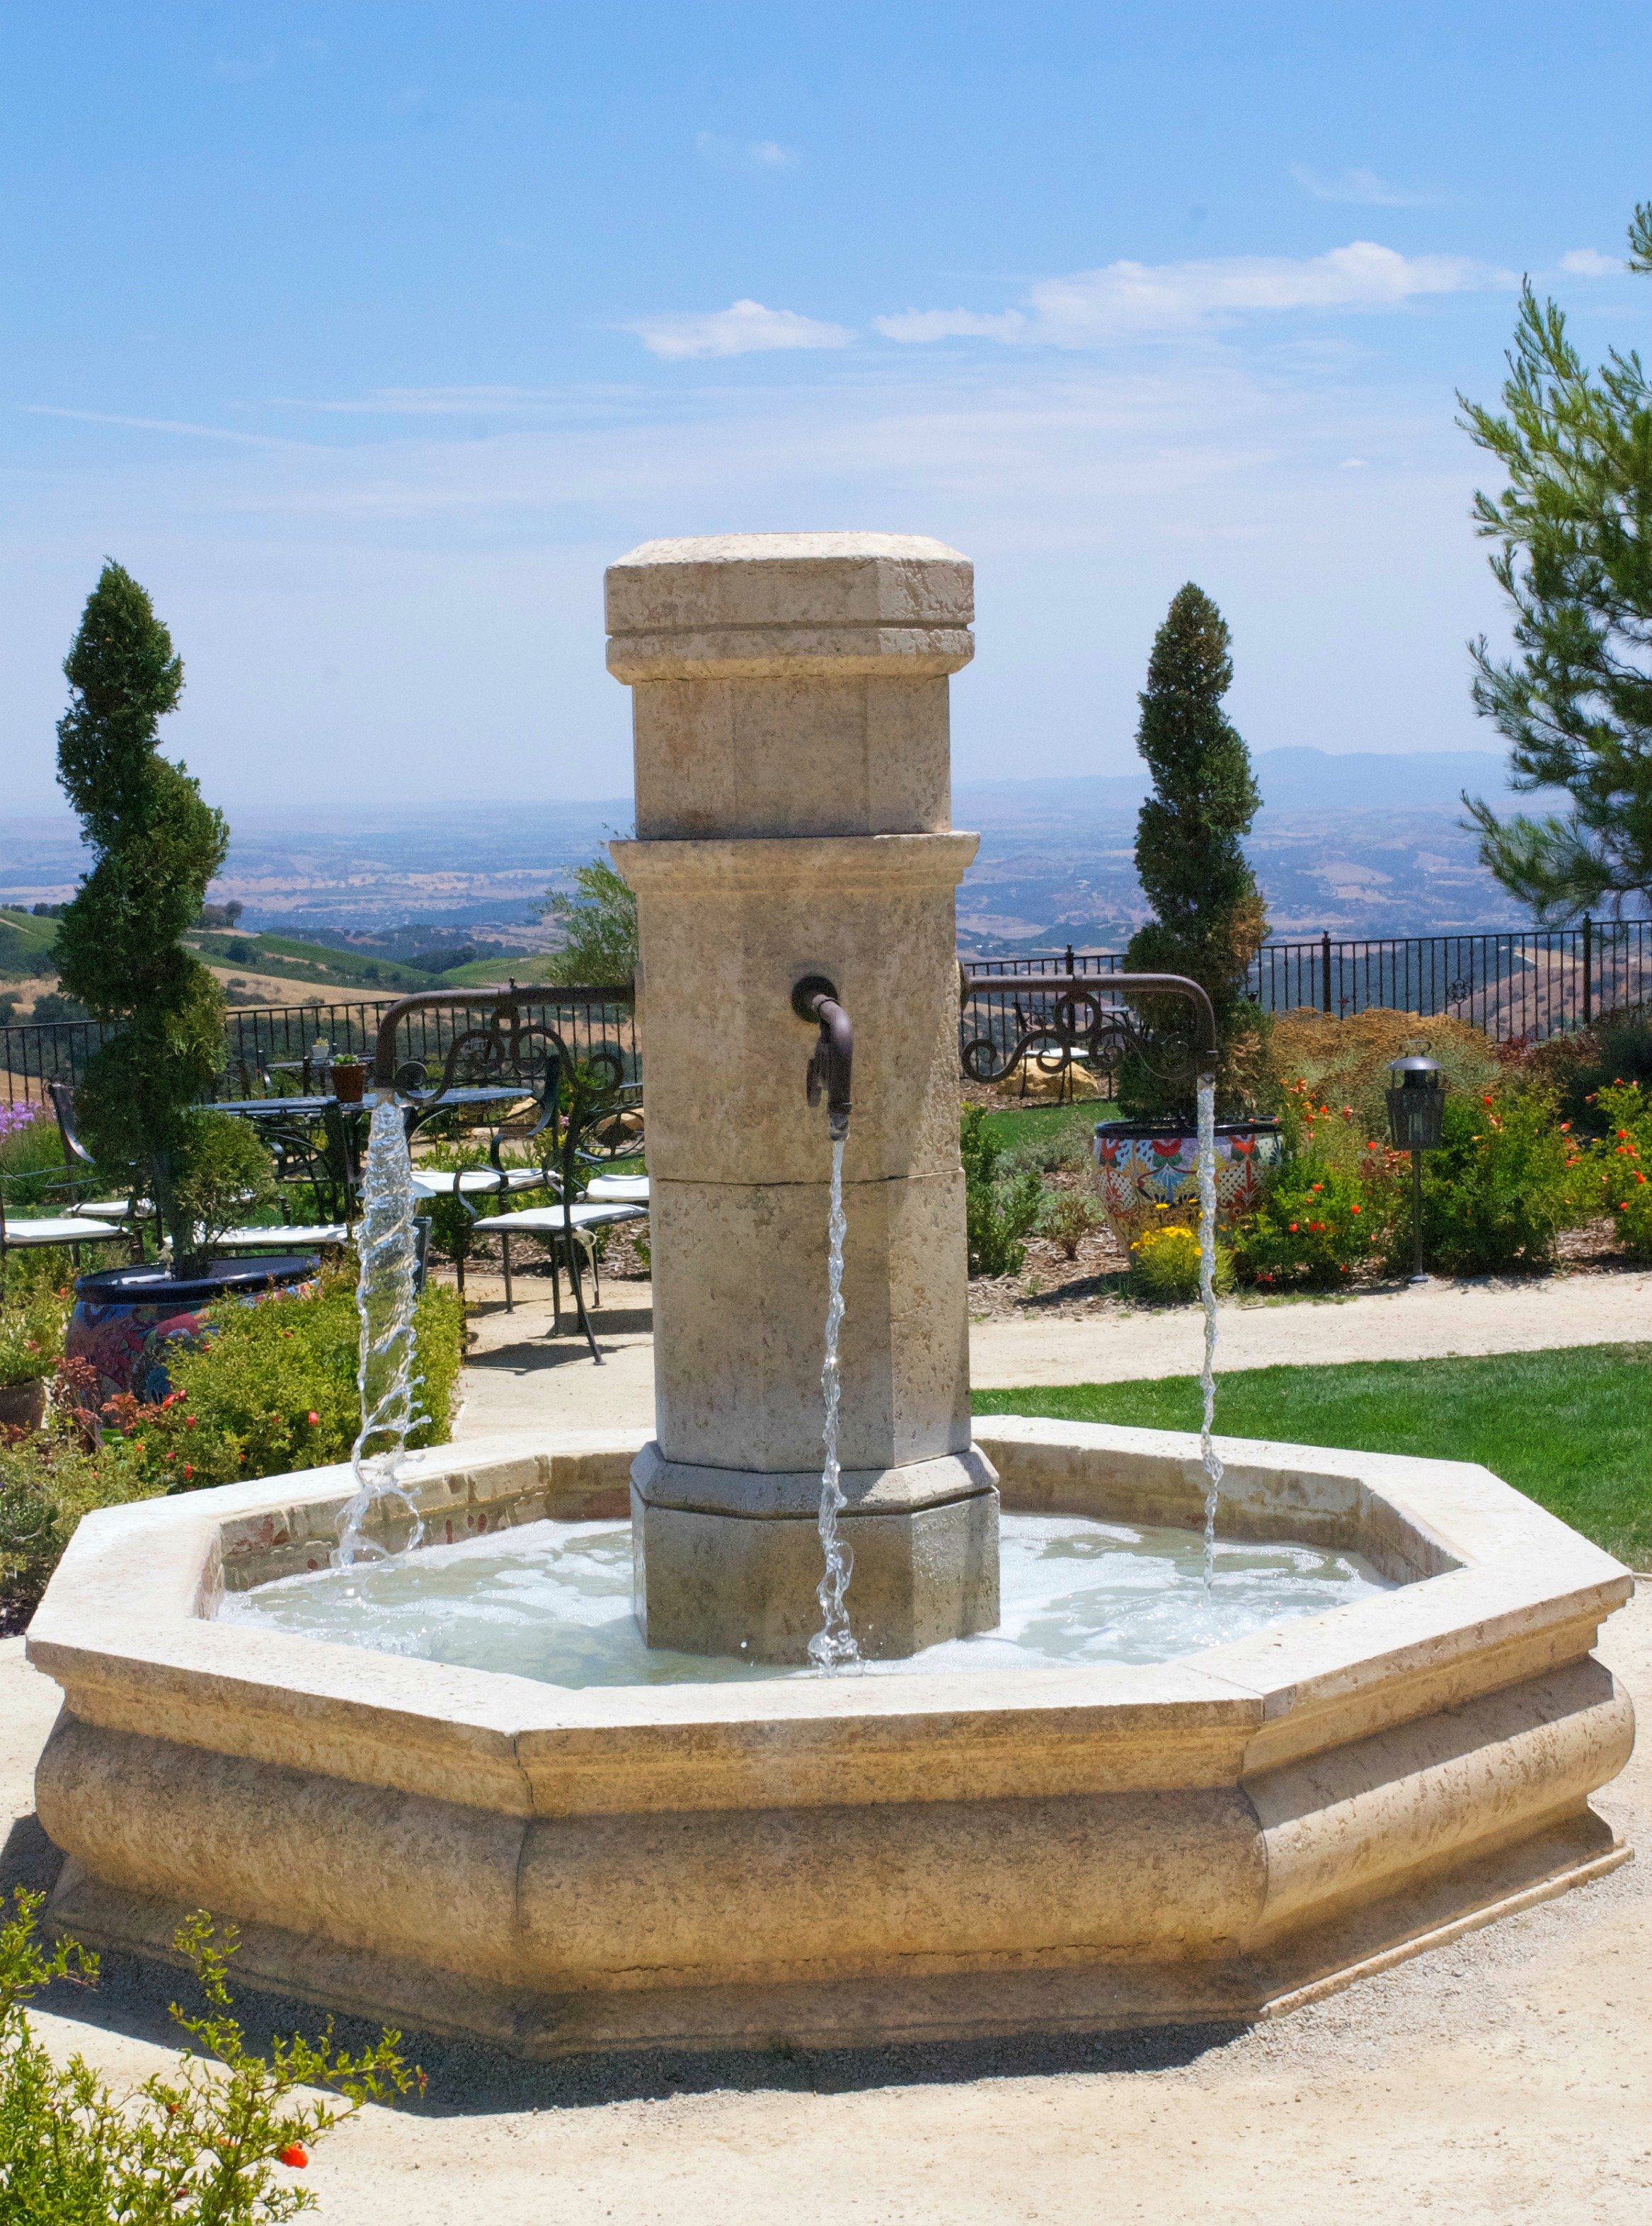 Daou Winery fountain